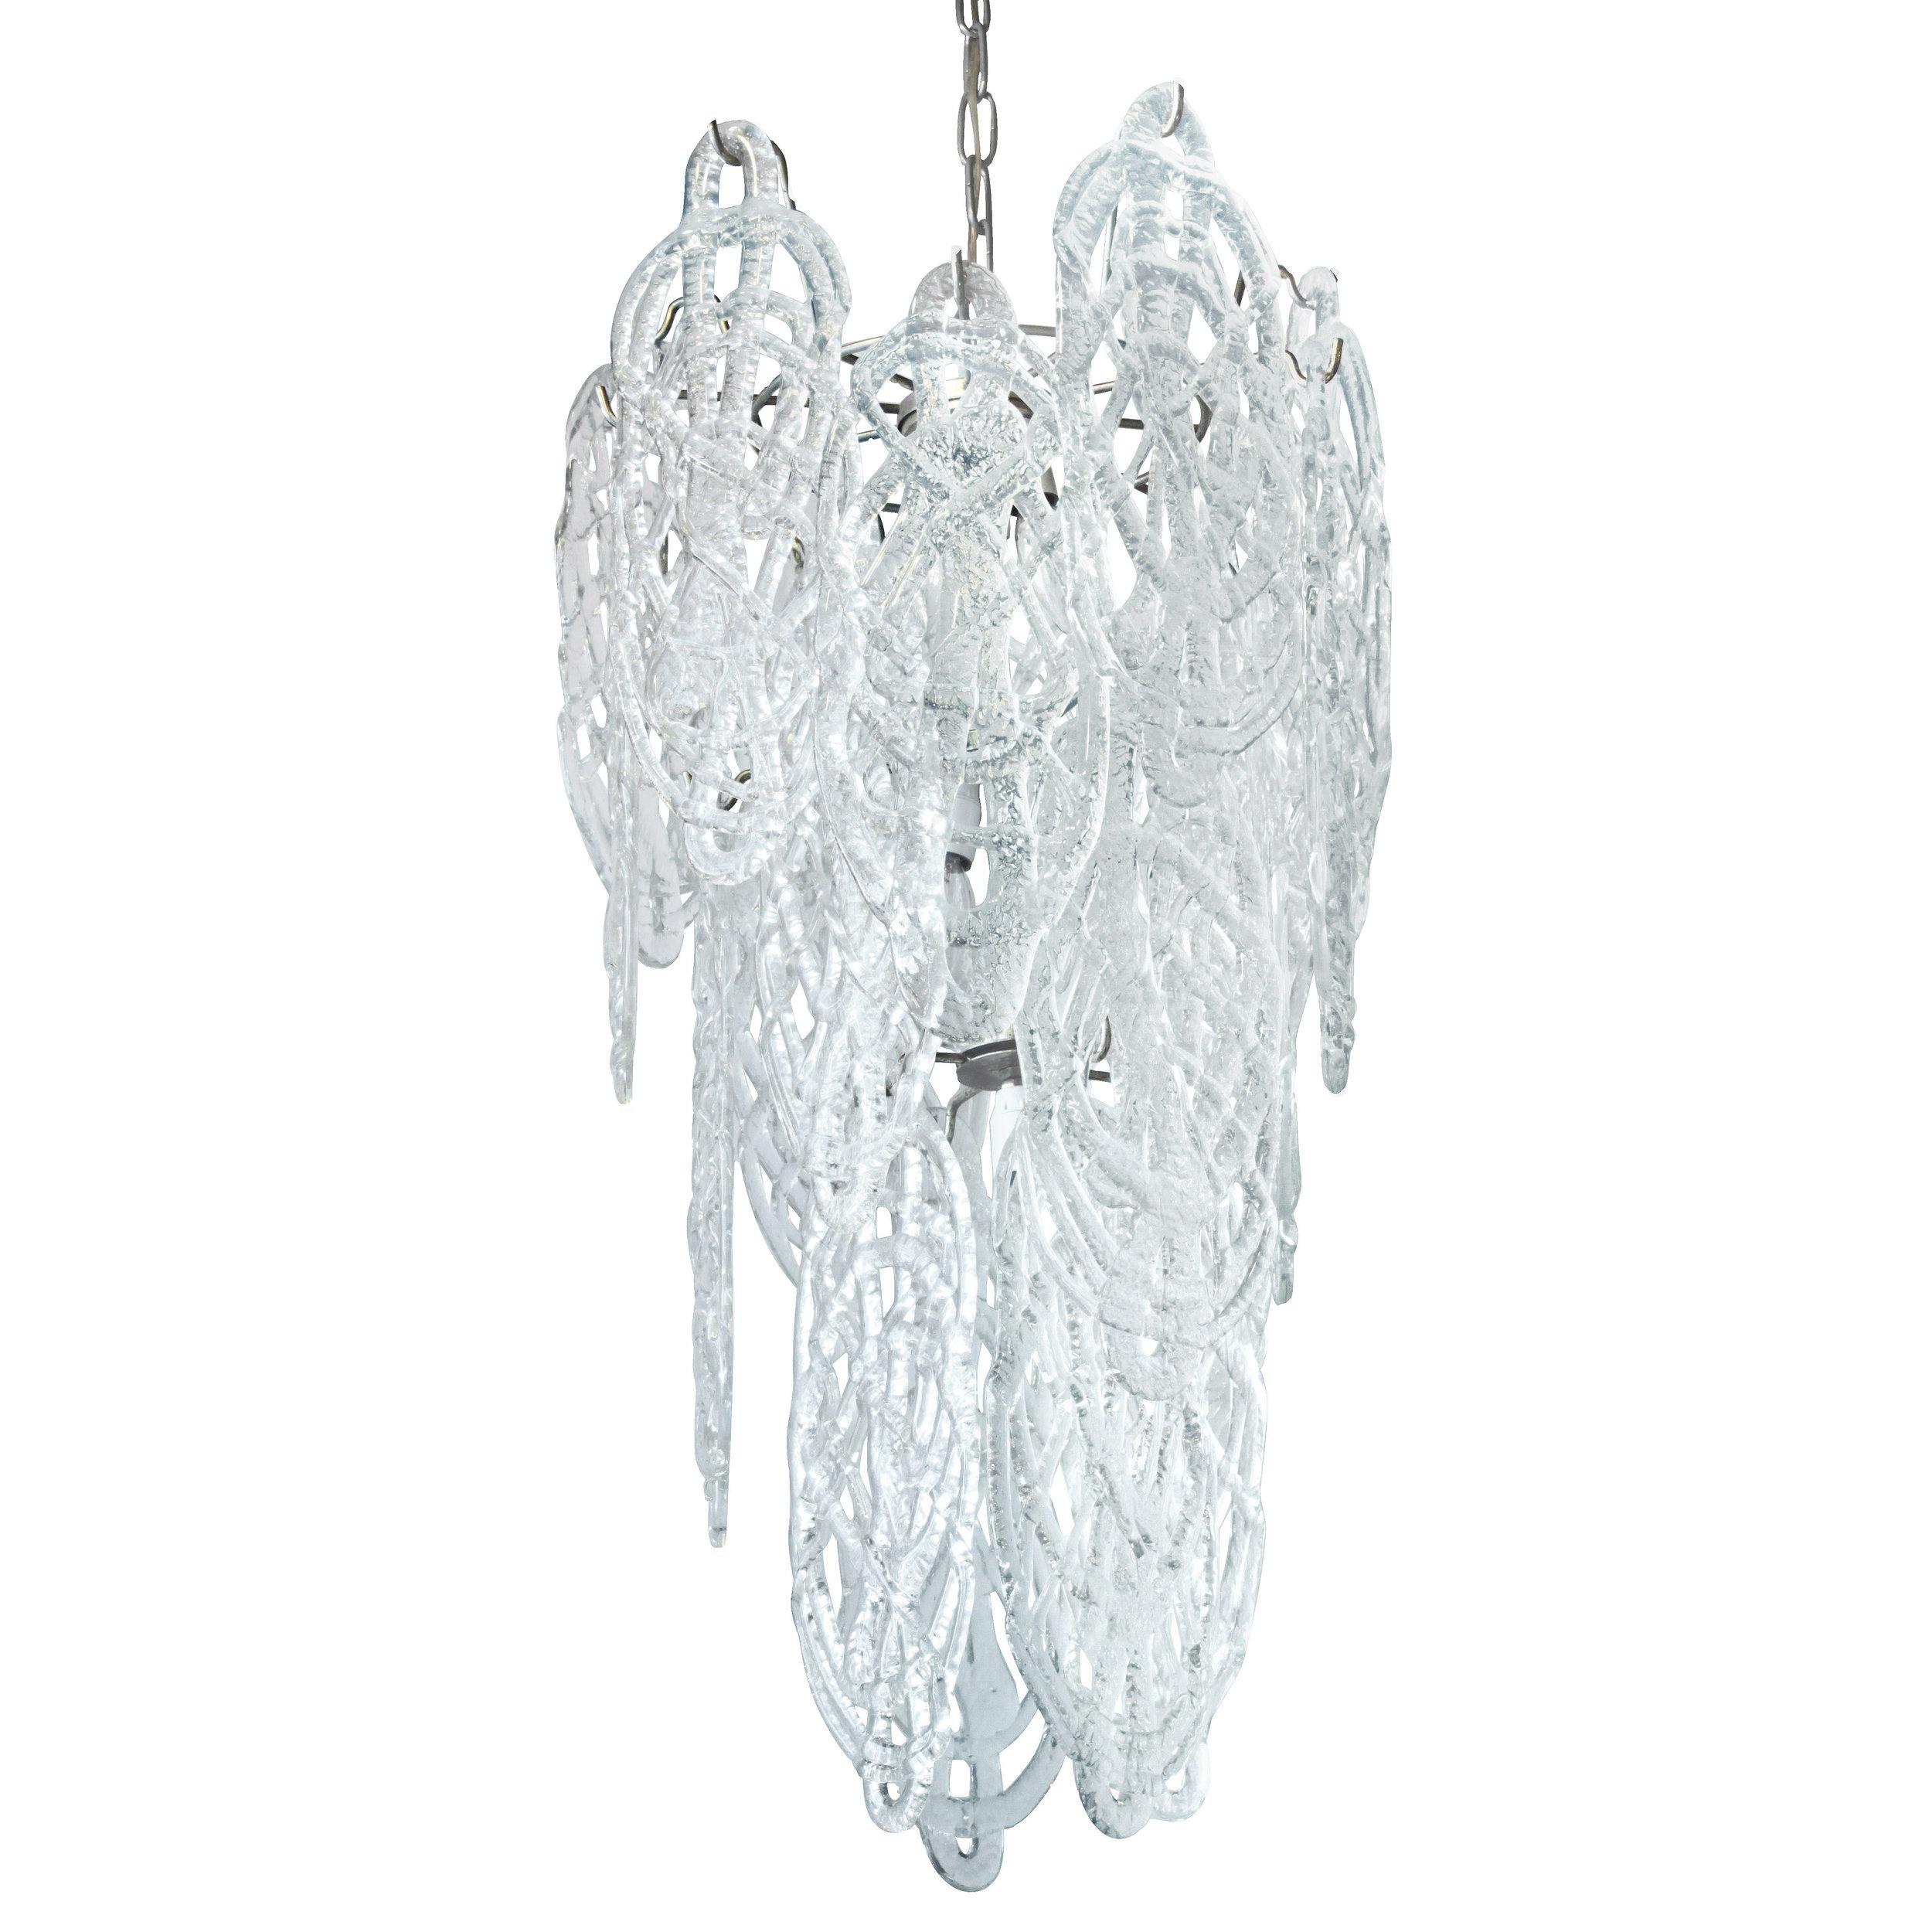 Mazzega 75 spiderweb glass chandelier217 hires.JPG